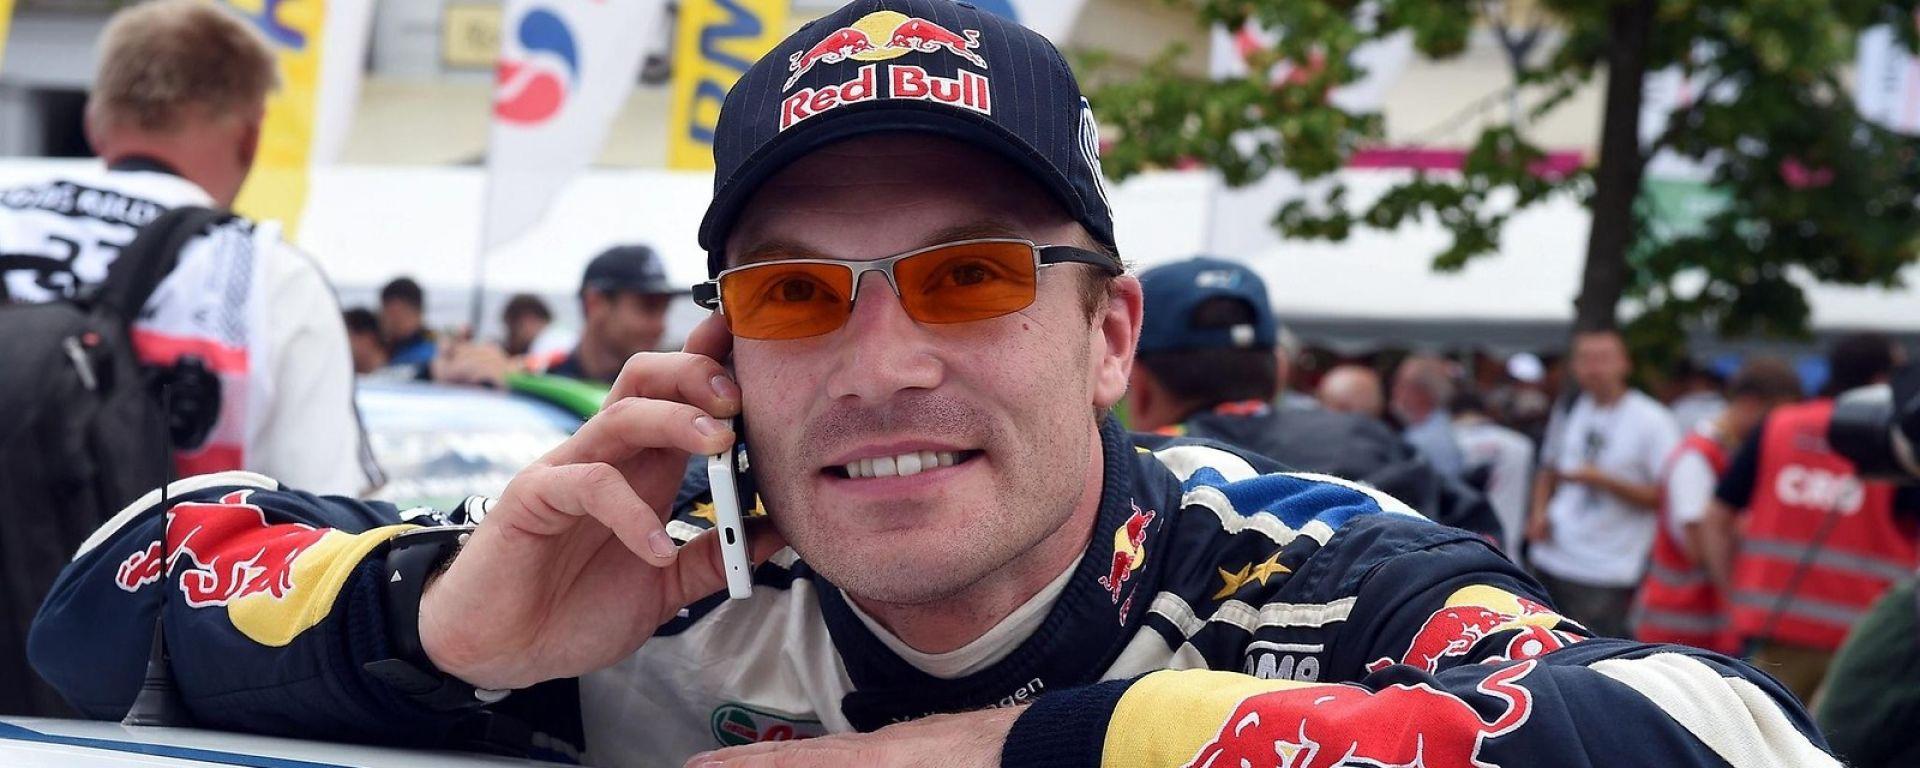 Jari Matti Latvala - Team Toyota Gazoo